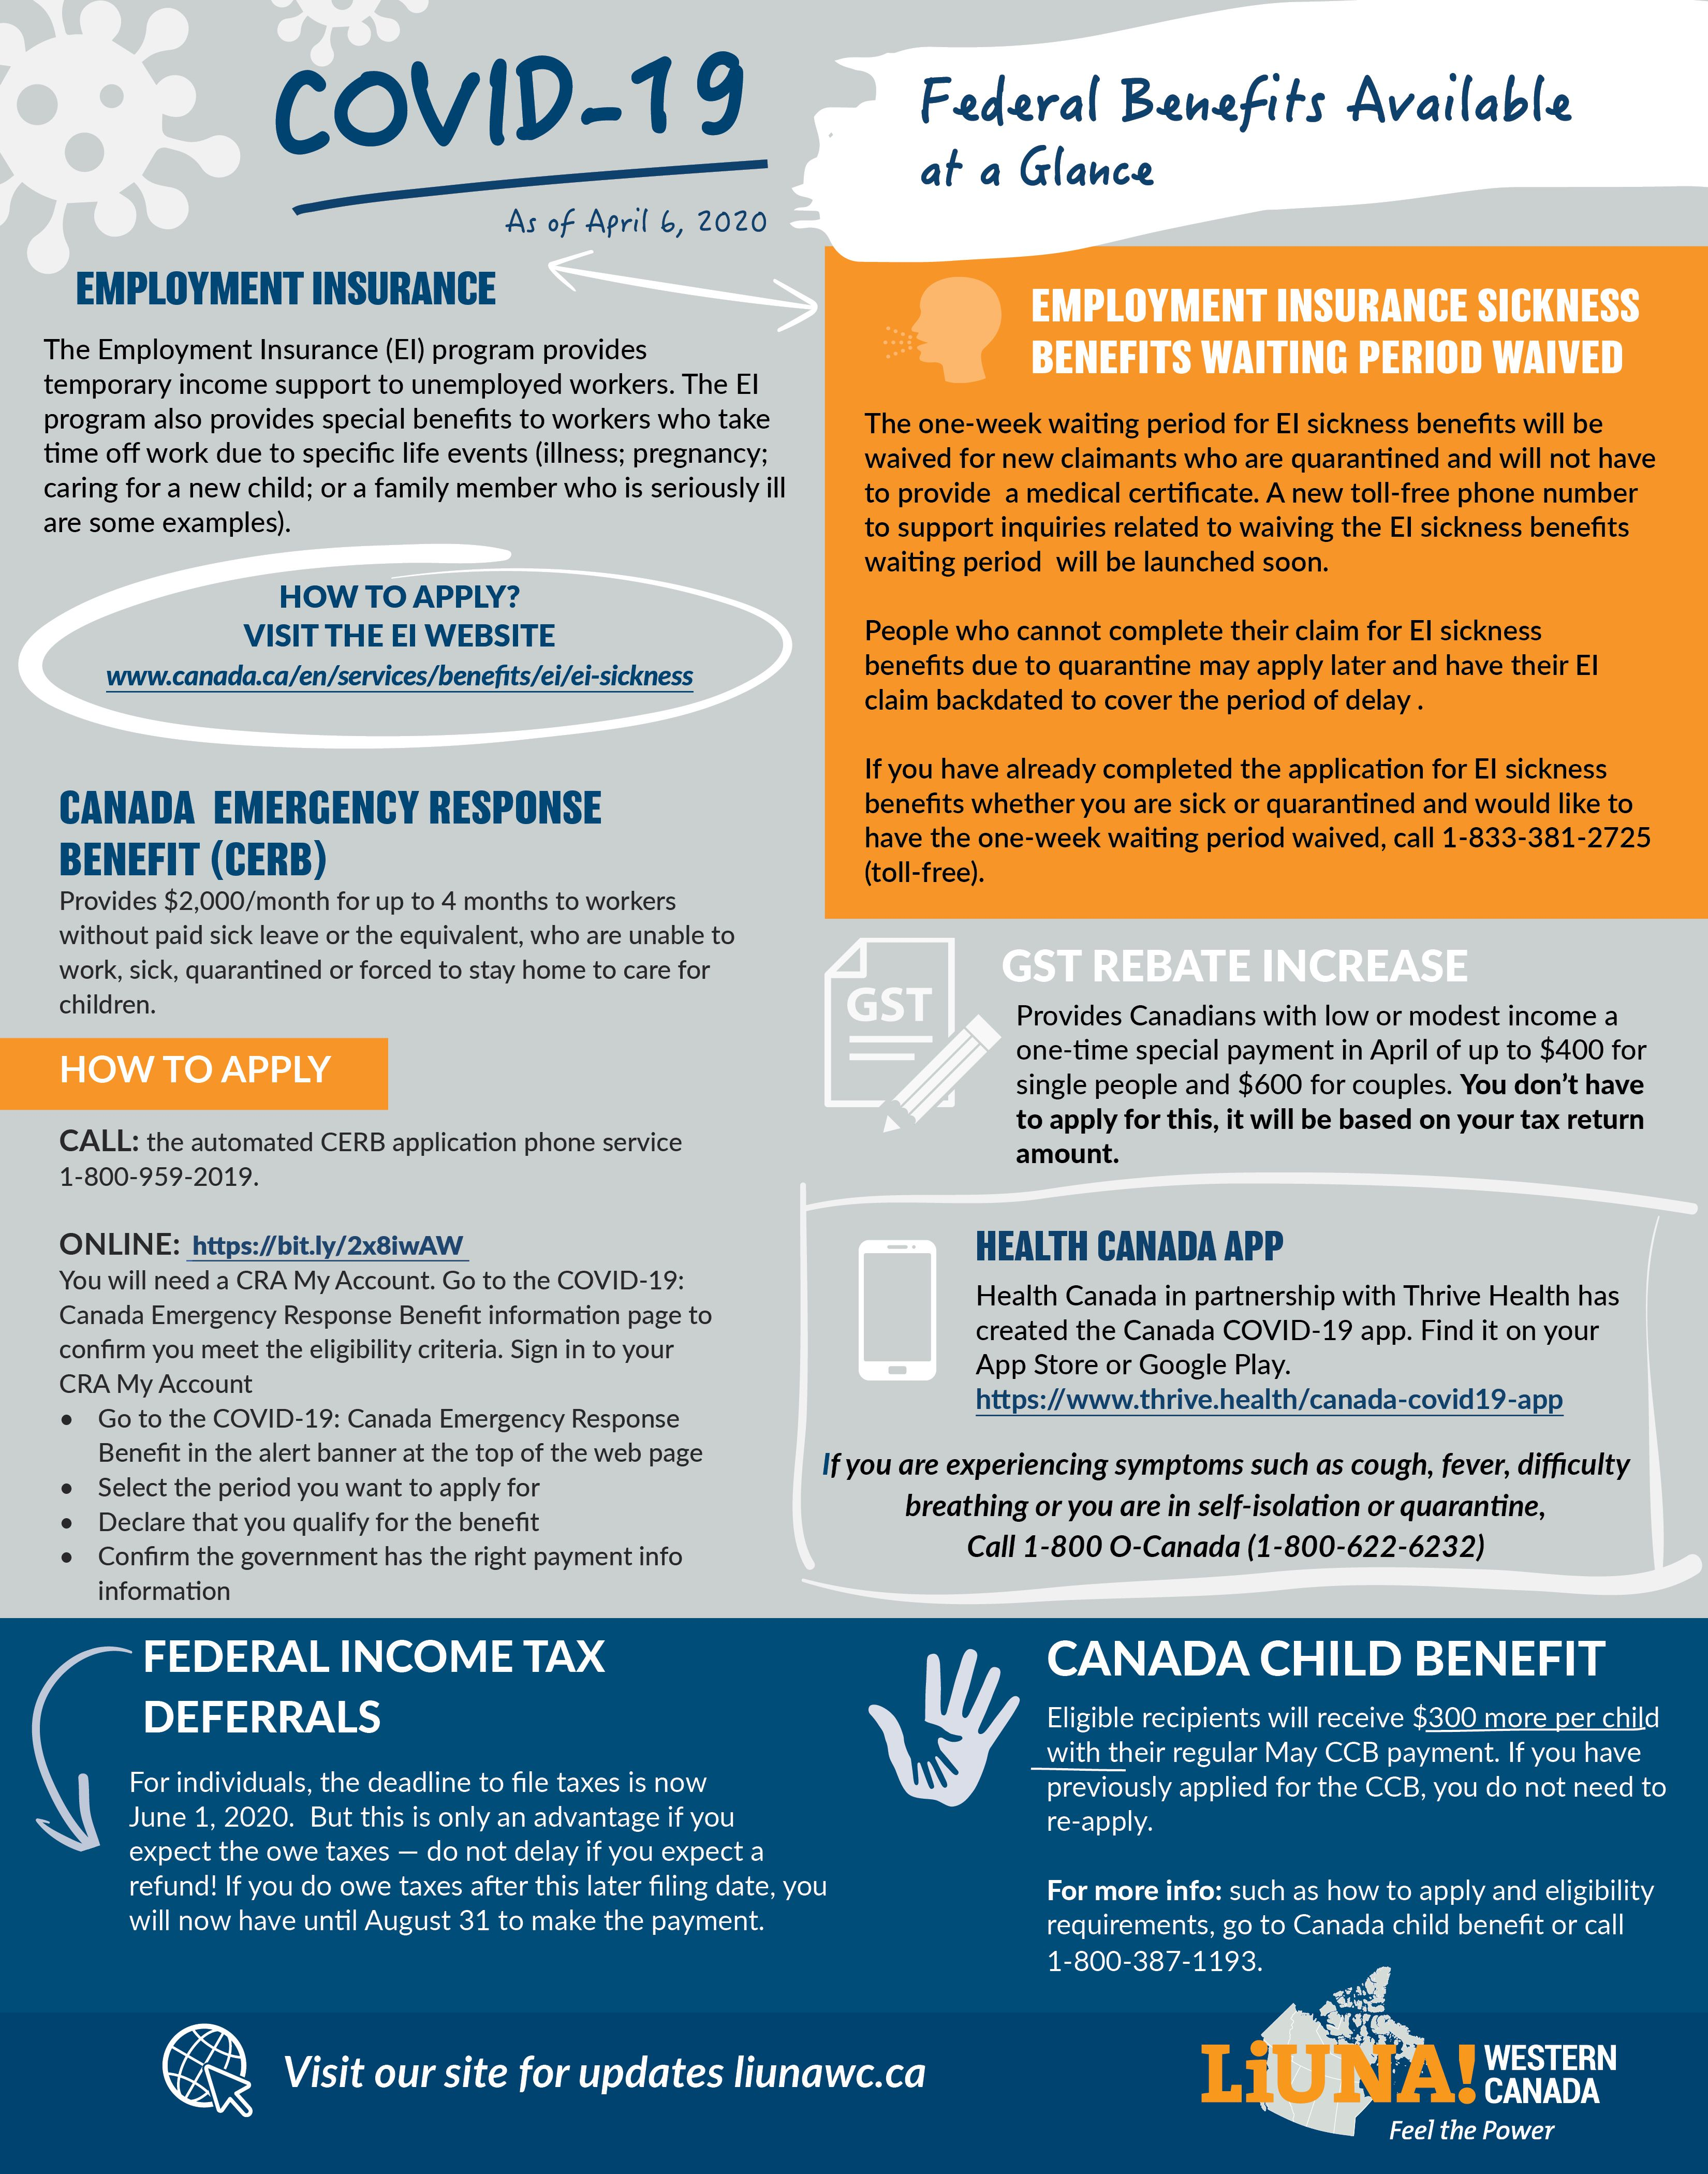 Coronavirus Benefit Infographic.April 2020.Original copy.jpg